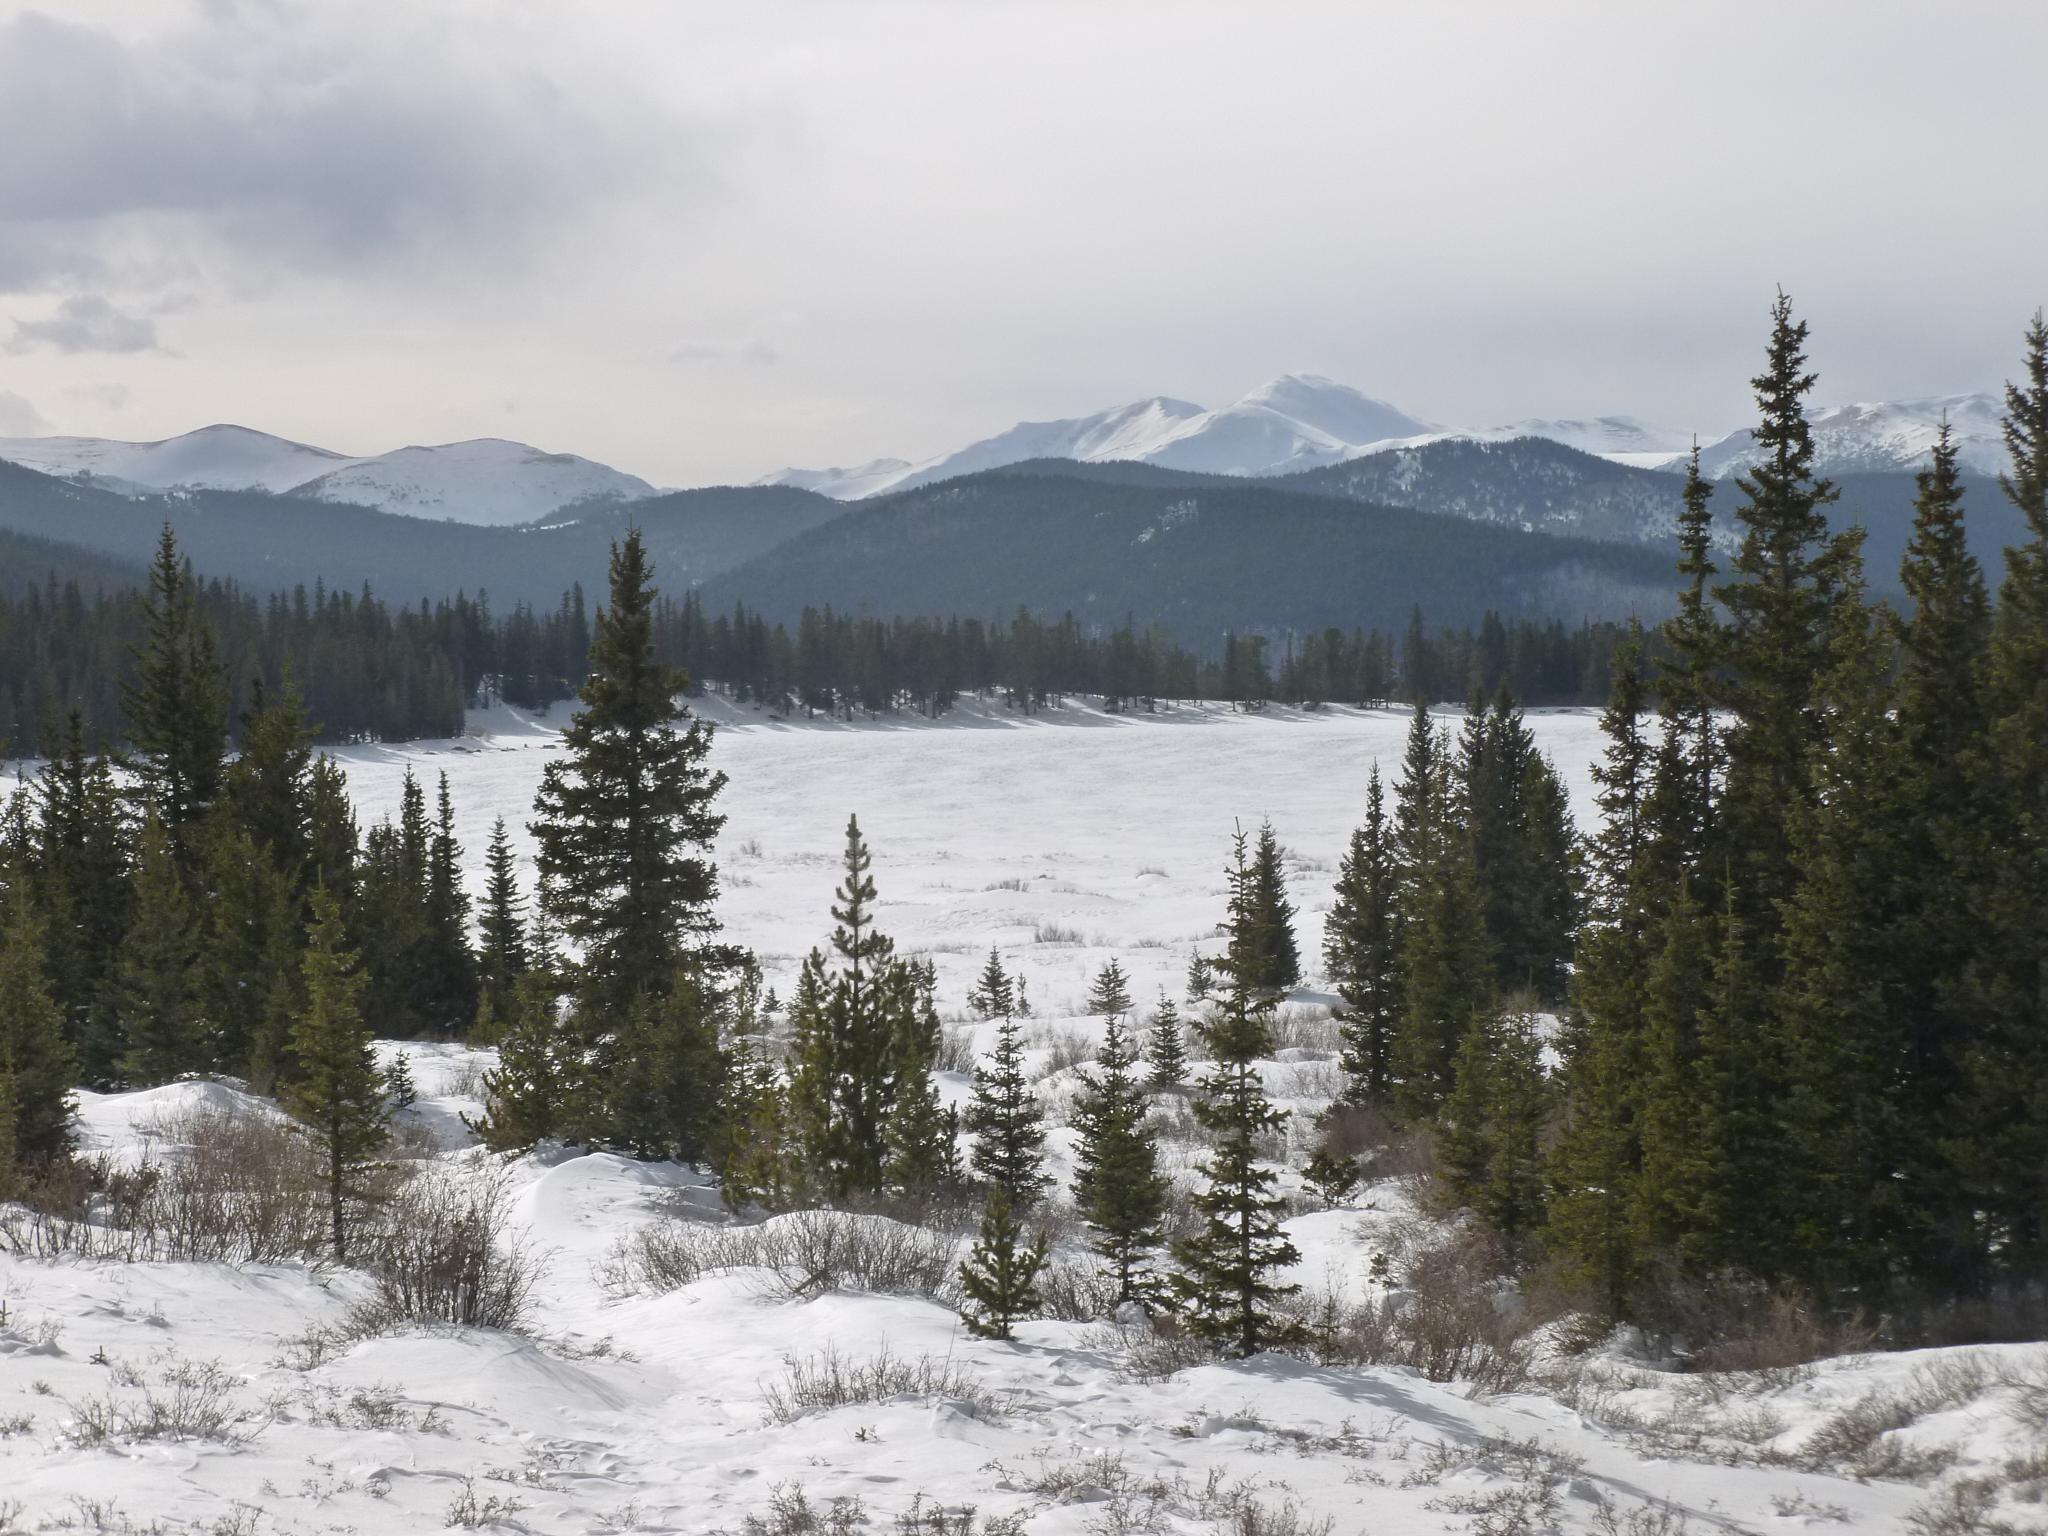 Mt Evans frozen lake by judylk57